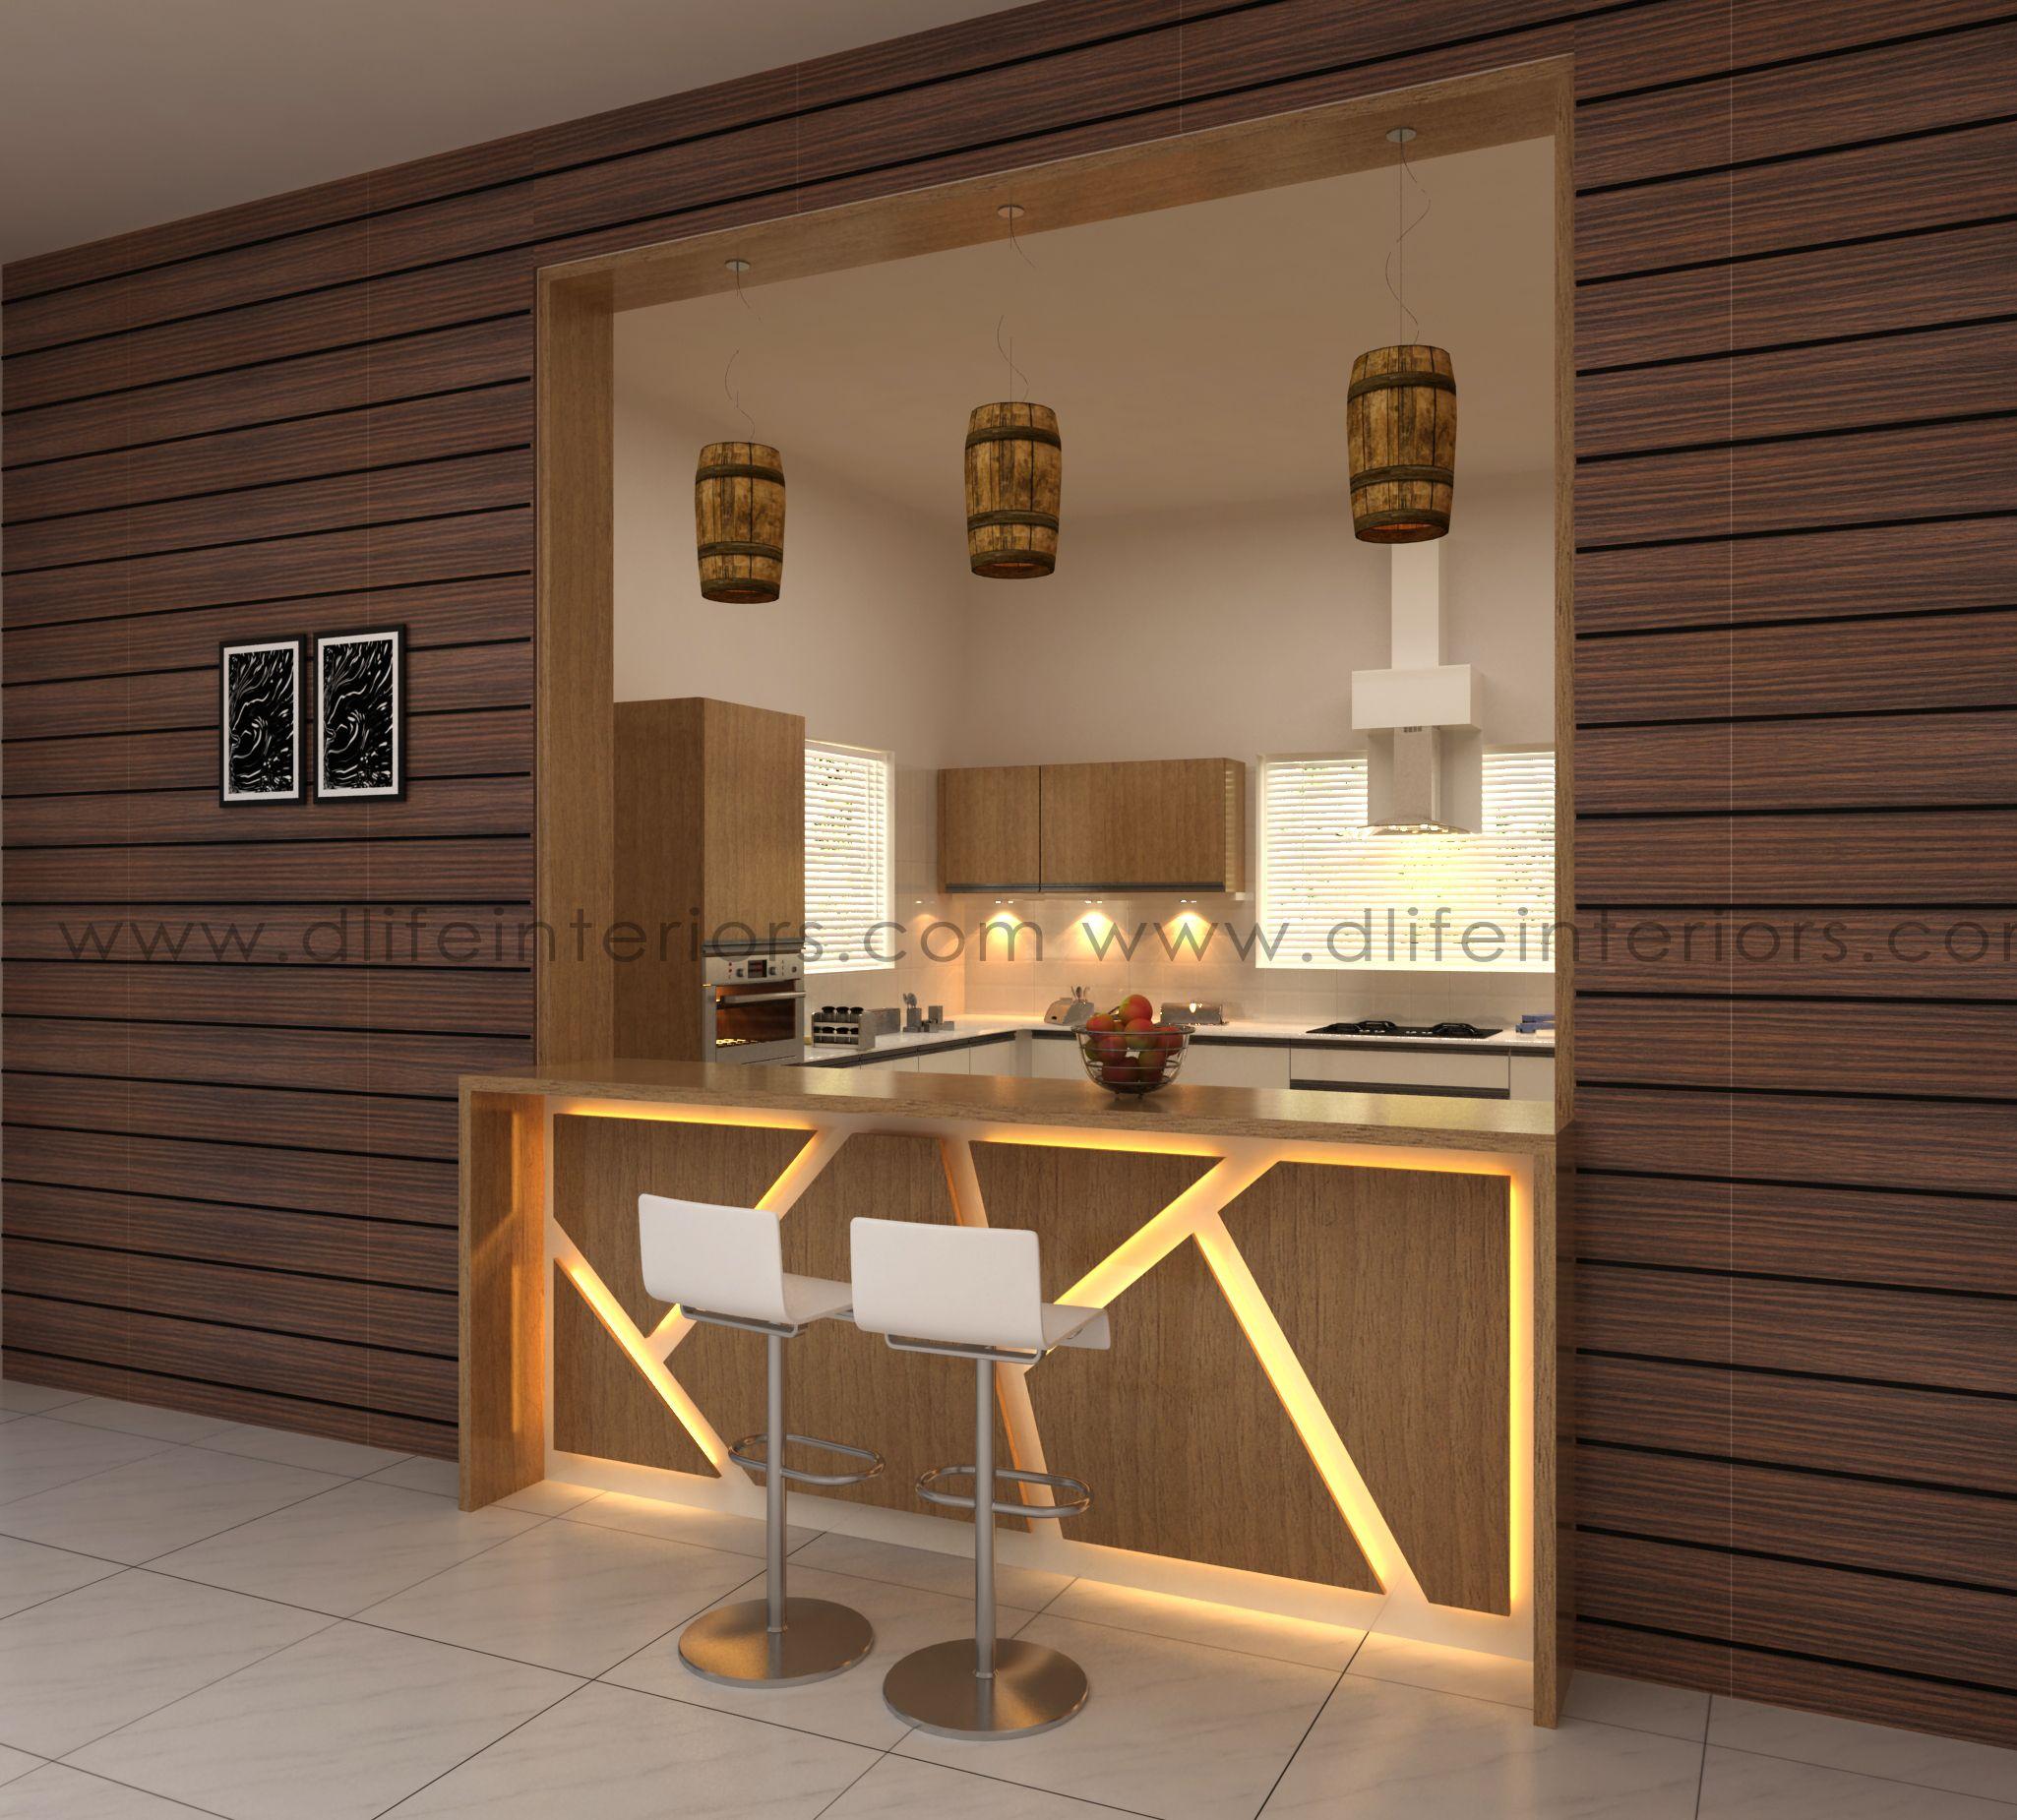 Contemporary Kerala Kitchen Work Area Design - WOWHOMY